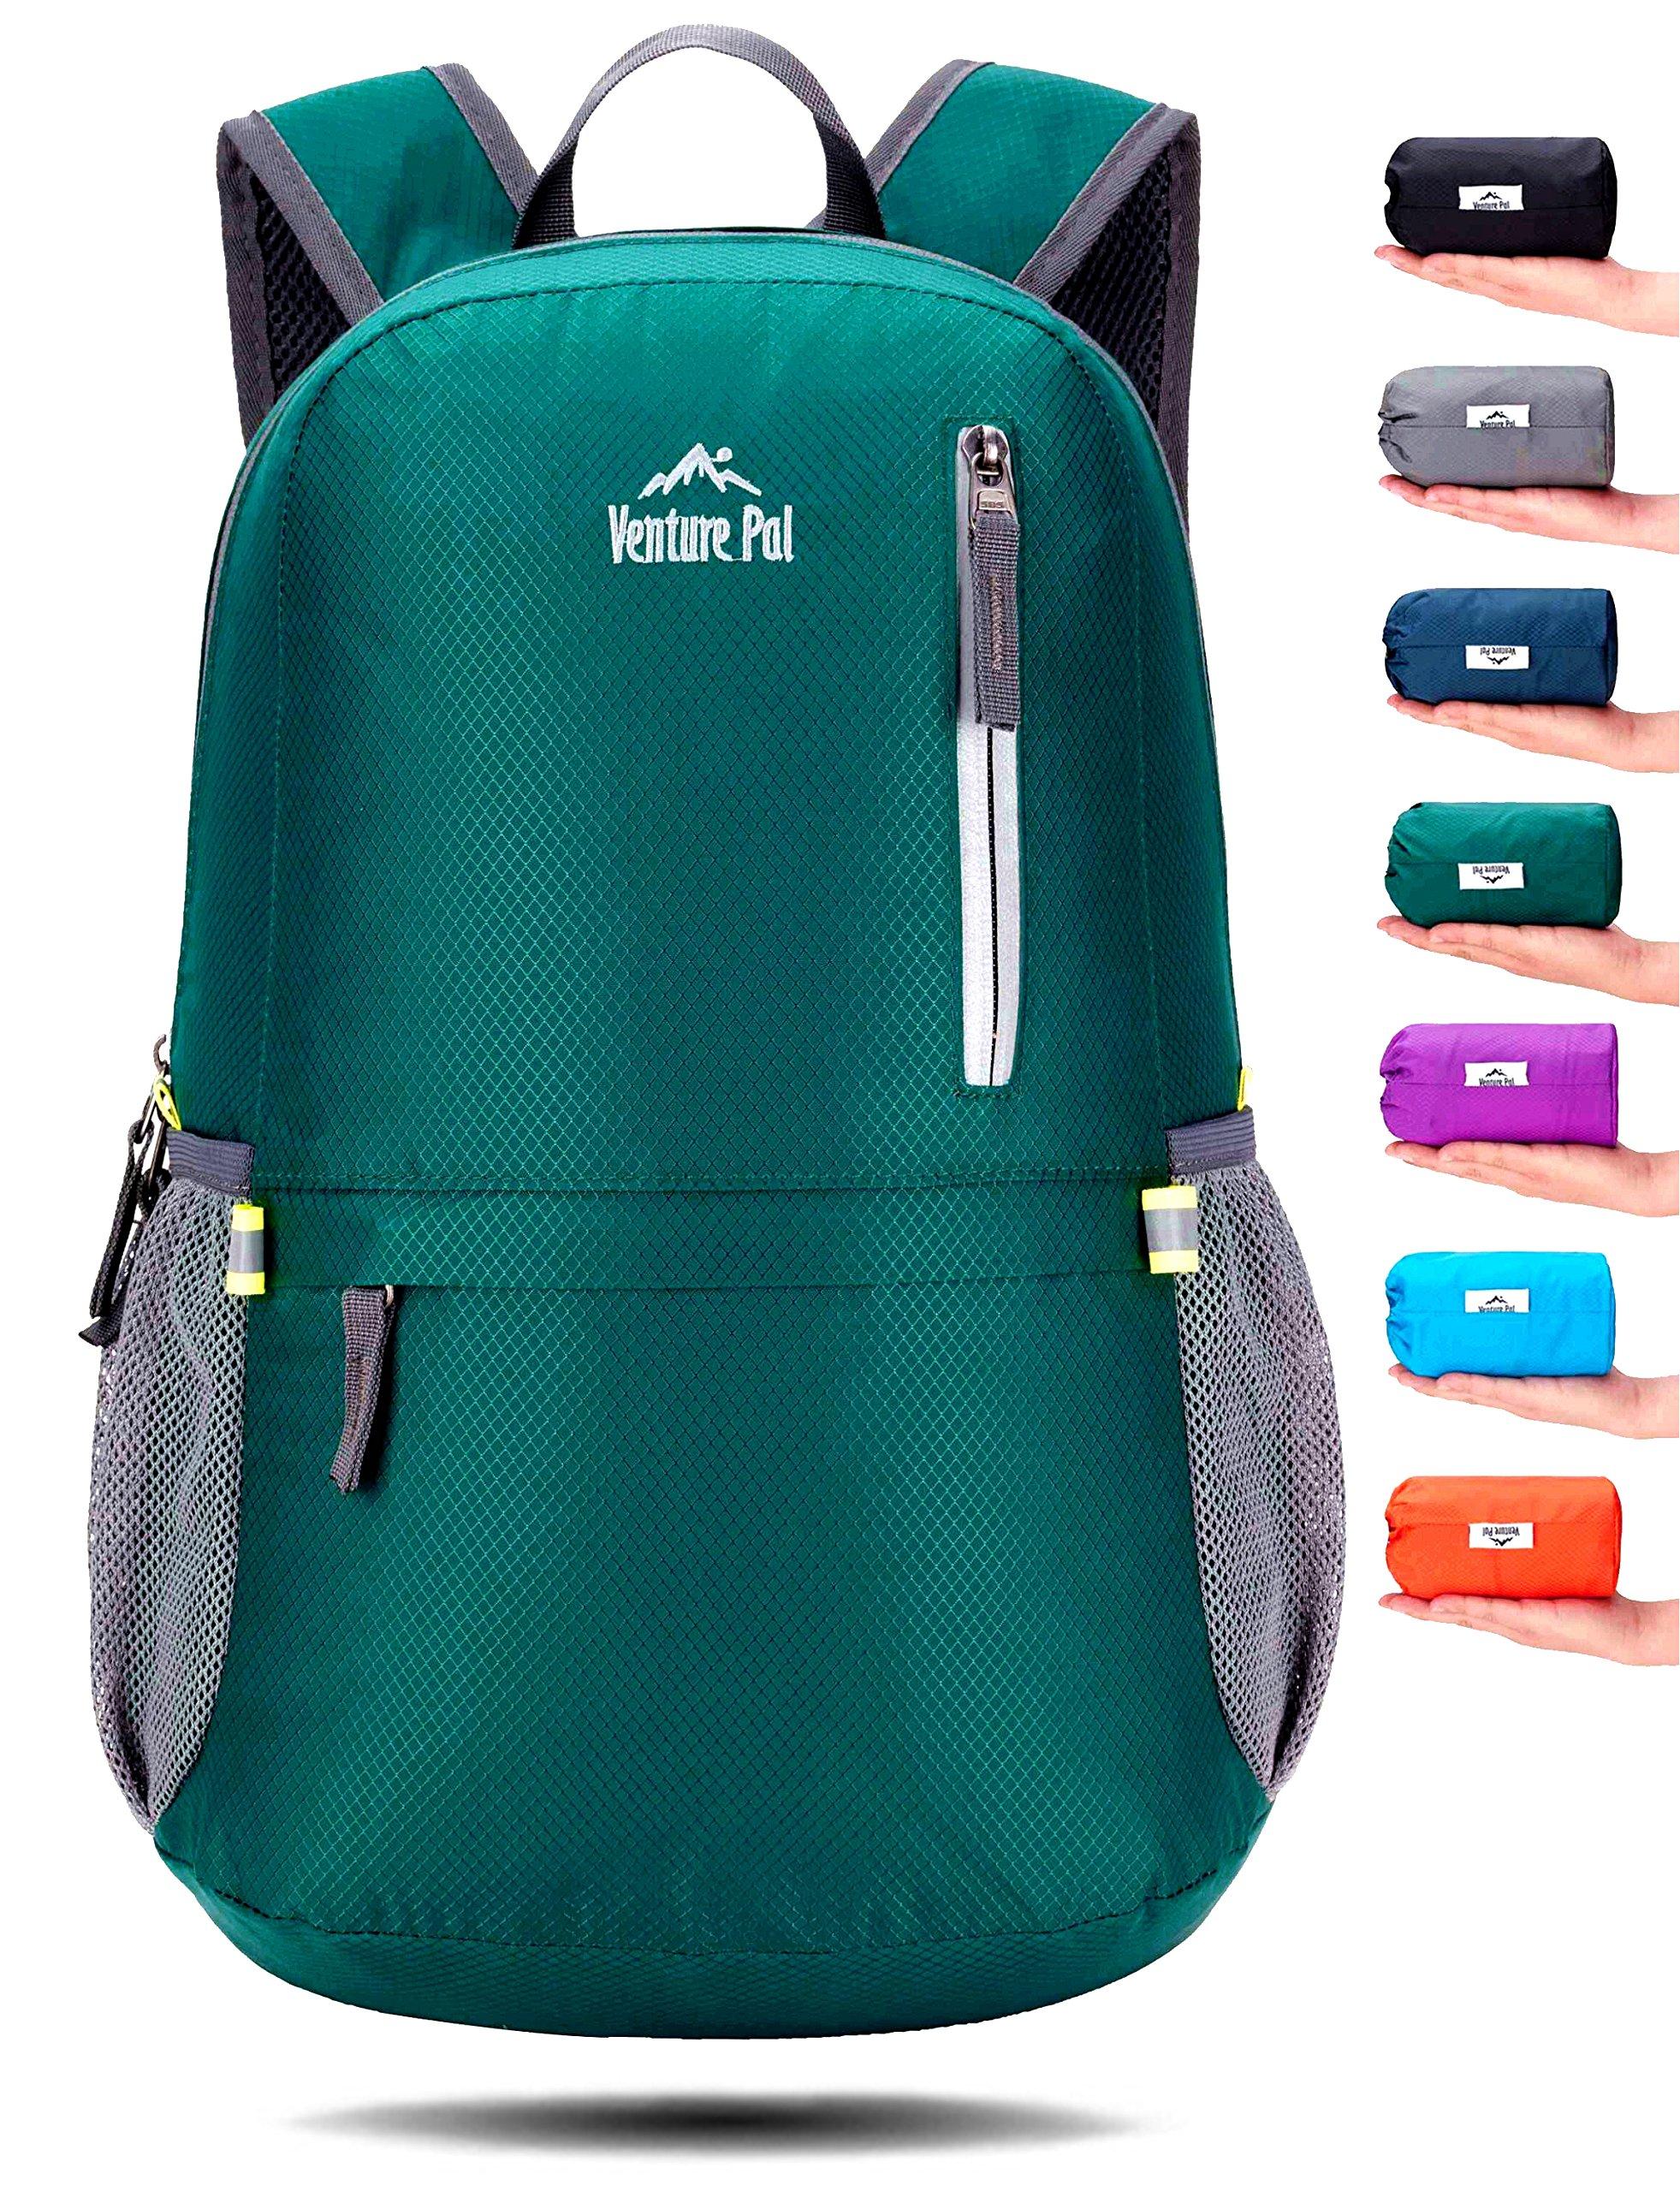 Venture Pal 25L Travel Backpack - Durable Packable Lightweight Small Backpack Women Men (Green) …